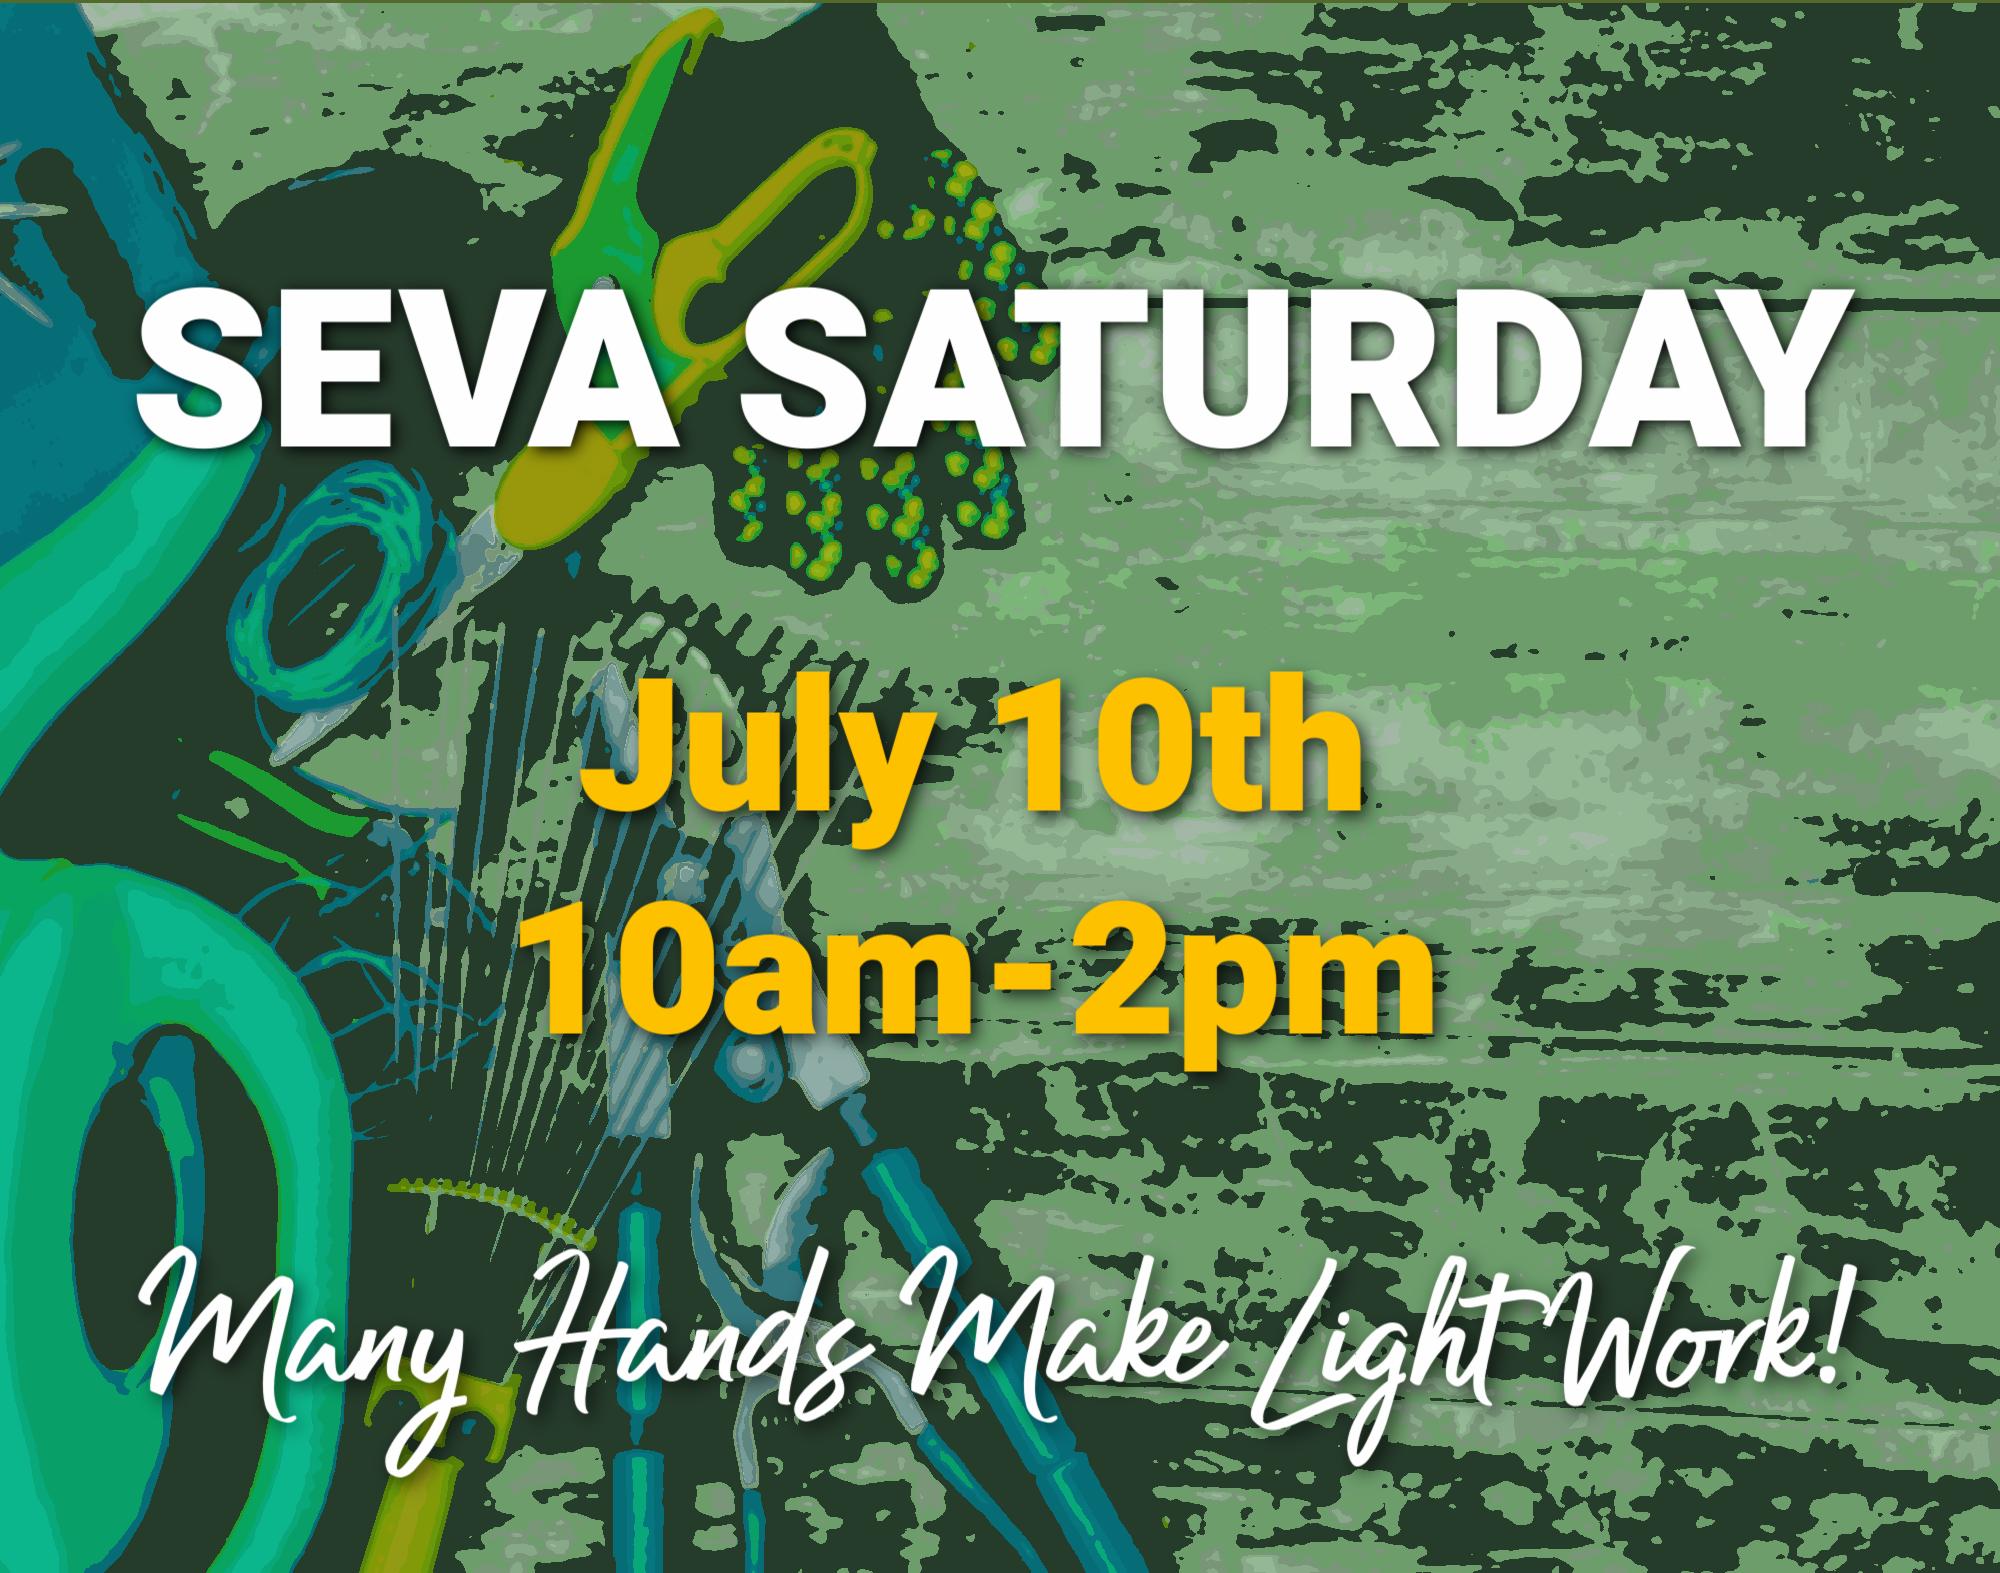 Seva Saturday for July